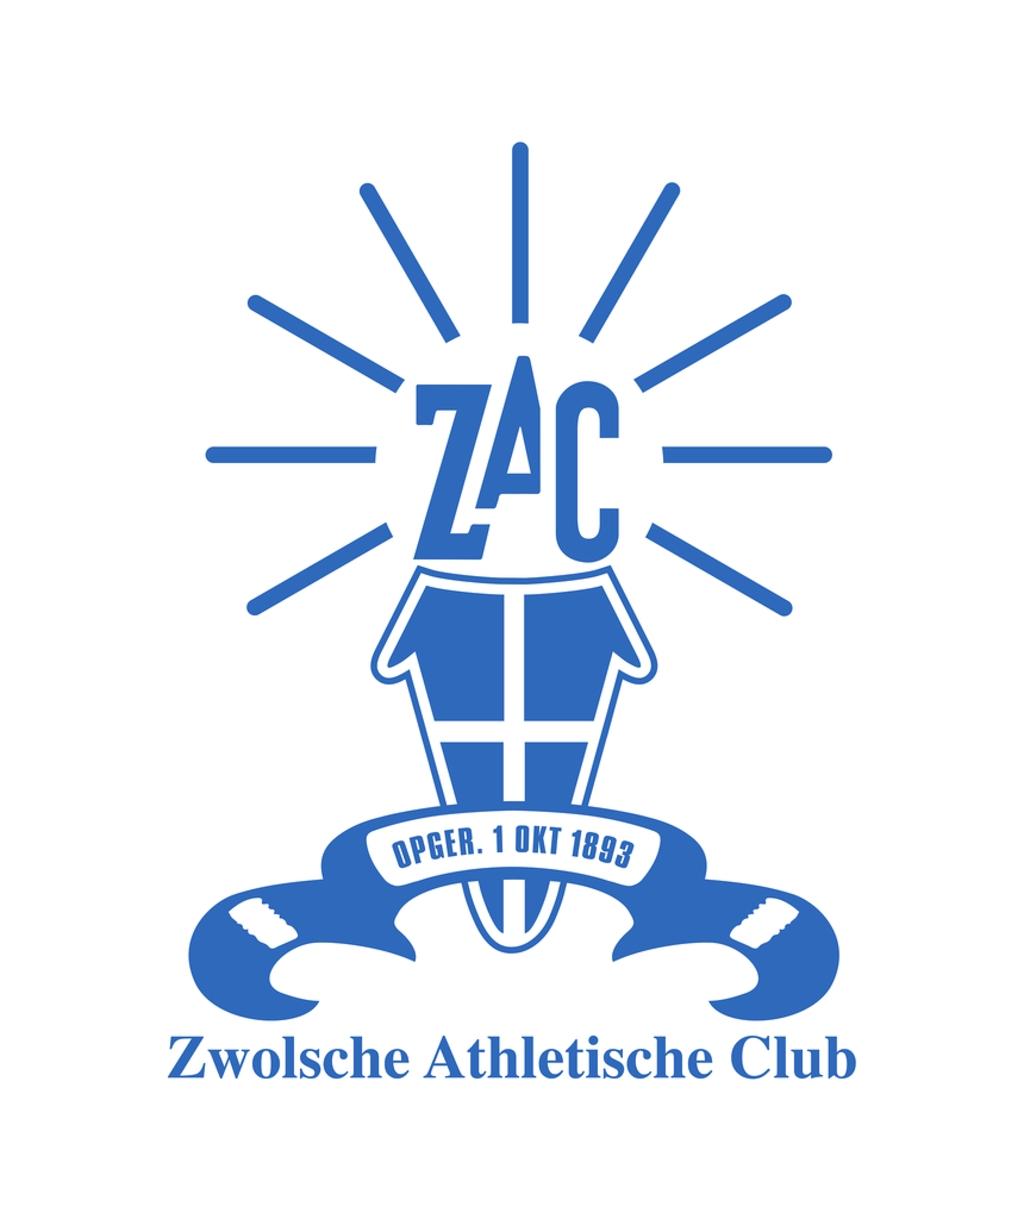 <p>Logo van de oudste club van Zwolle.</p> <p>Foto: Z.A.C.&nbsp;</p>